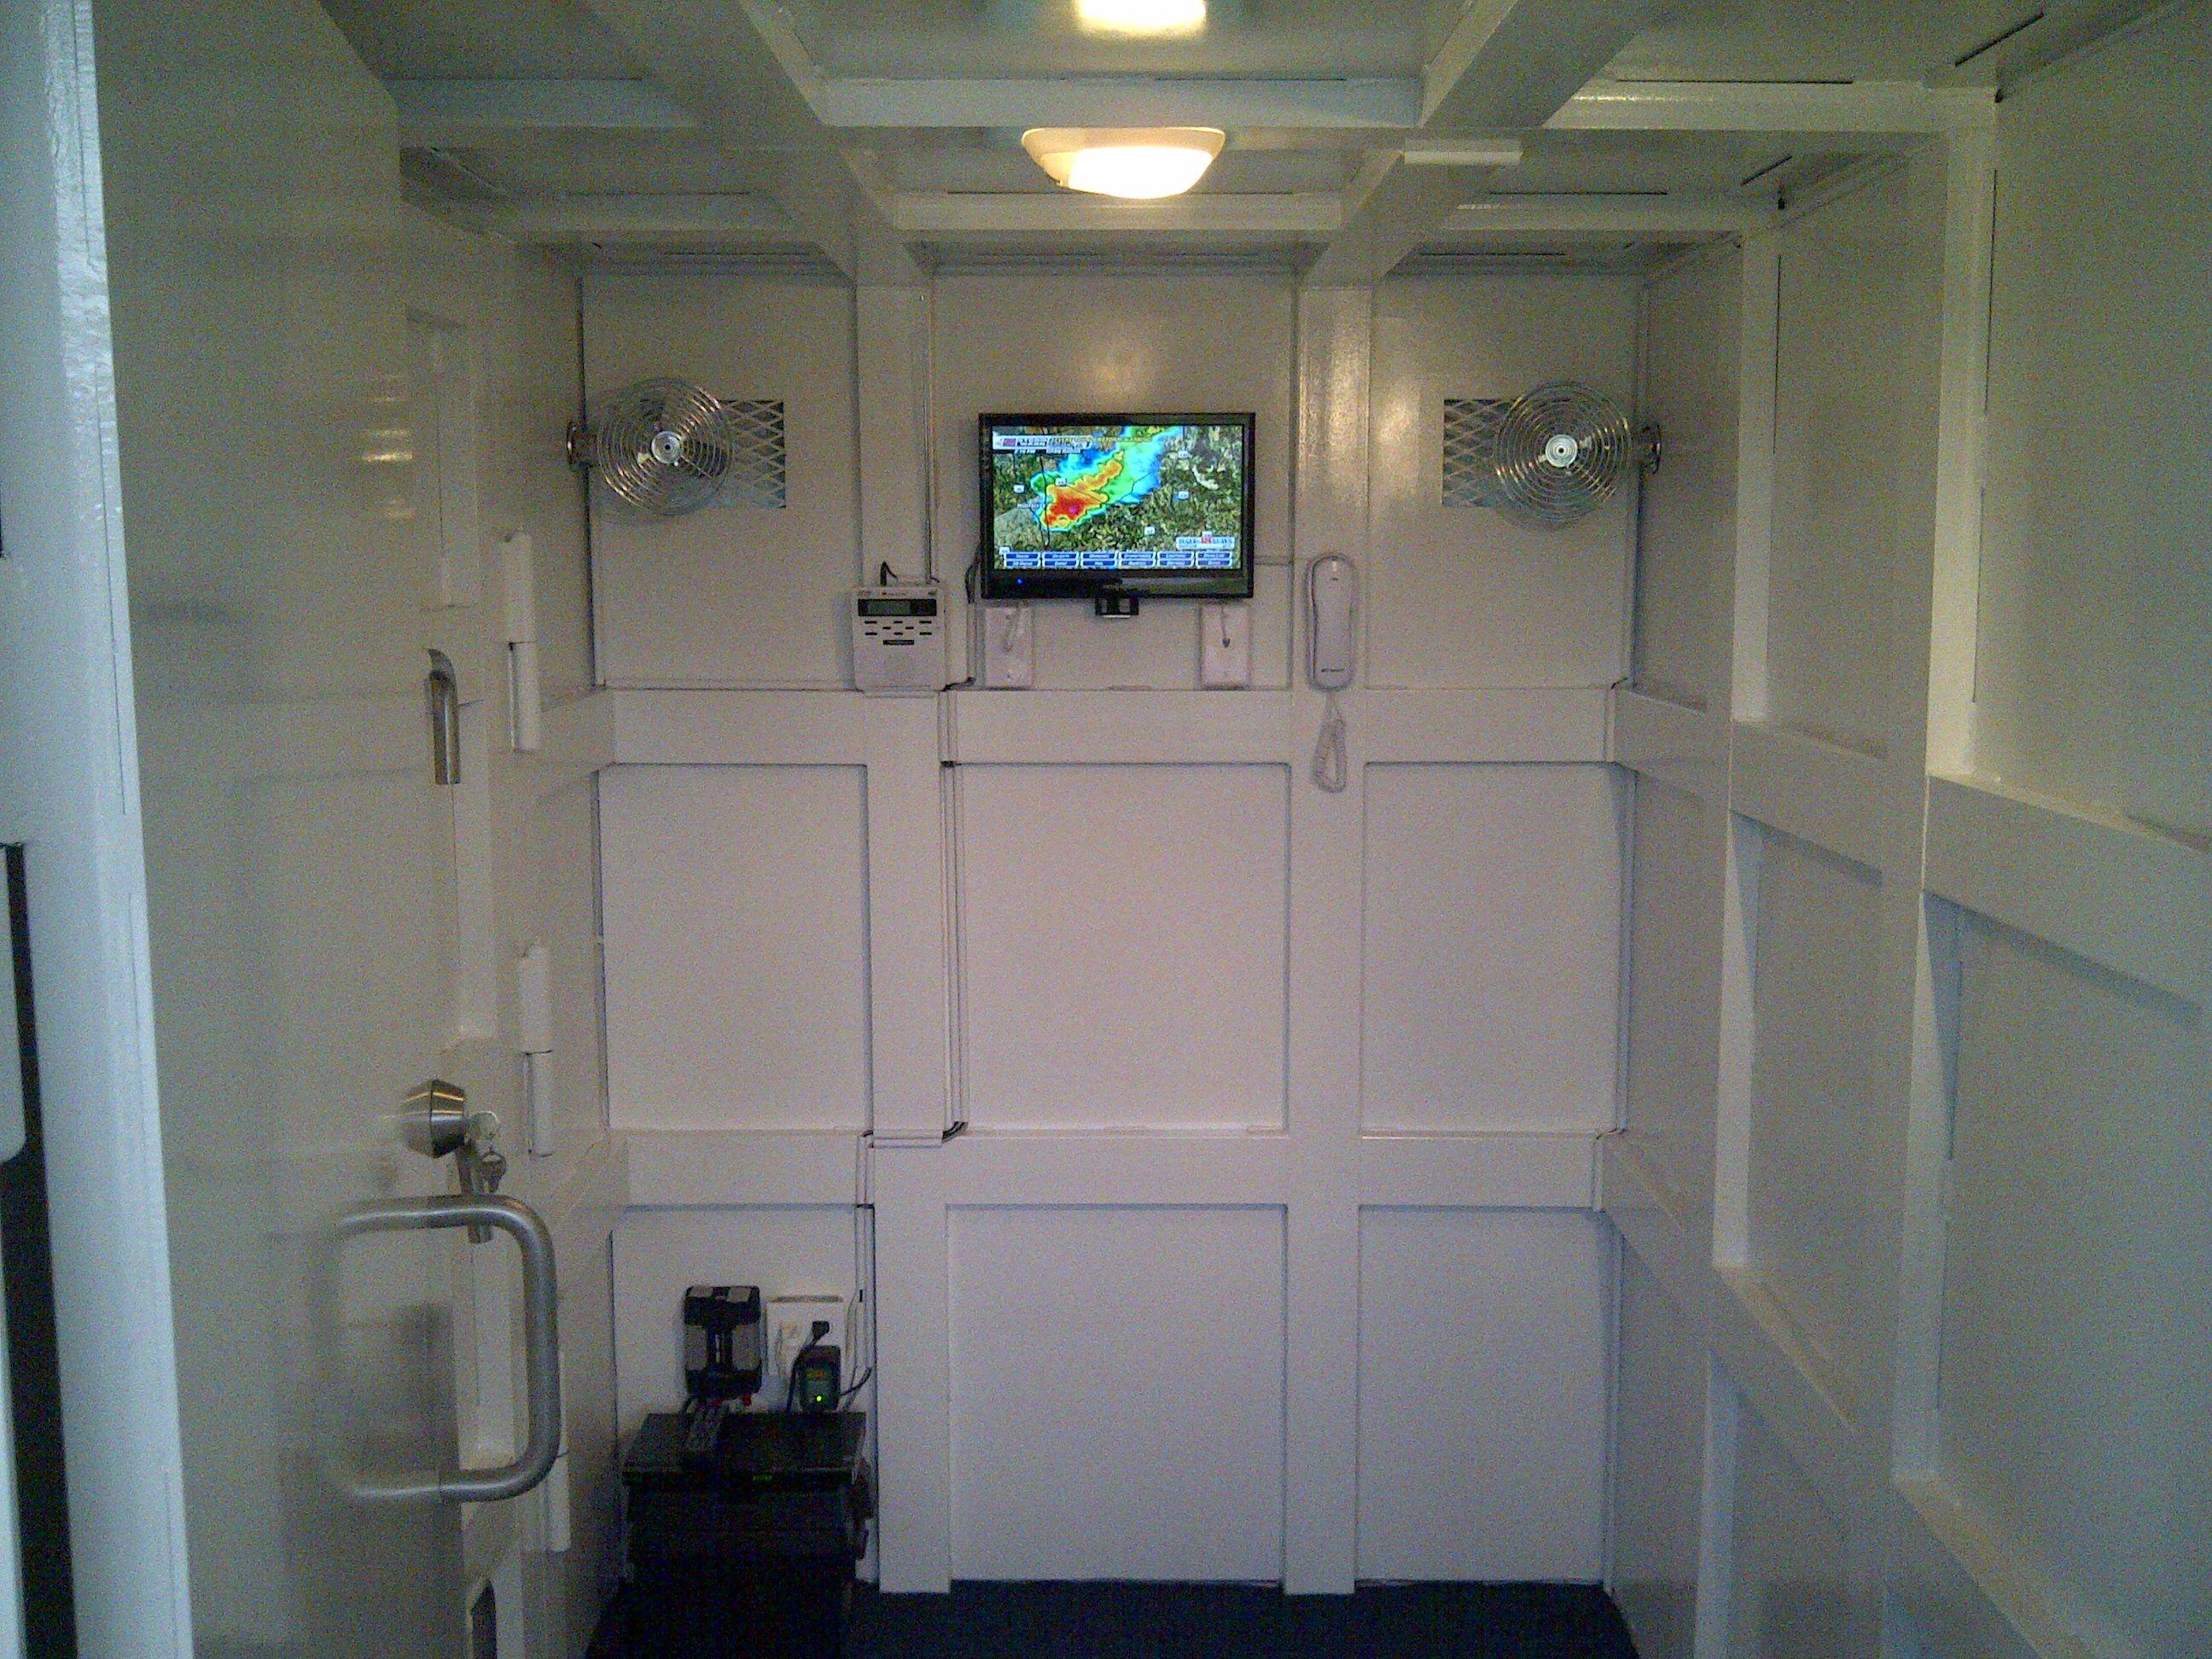 vaultspanicrooms rooms panic frank zykan llc doors safe room vault